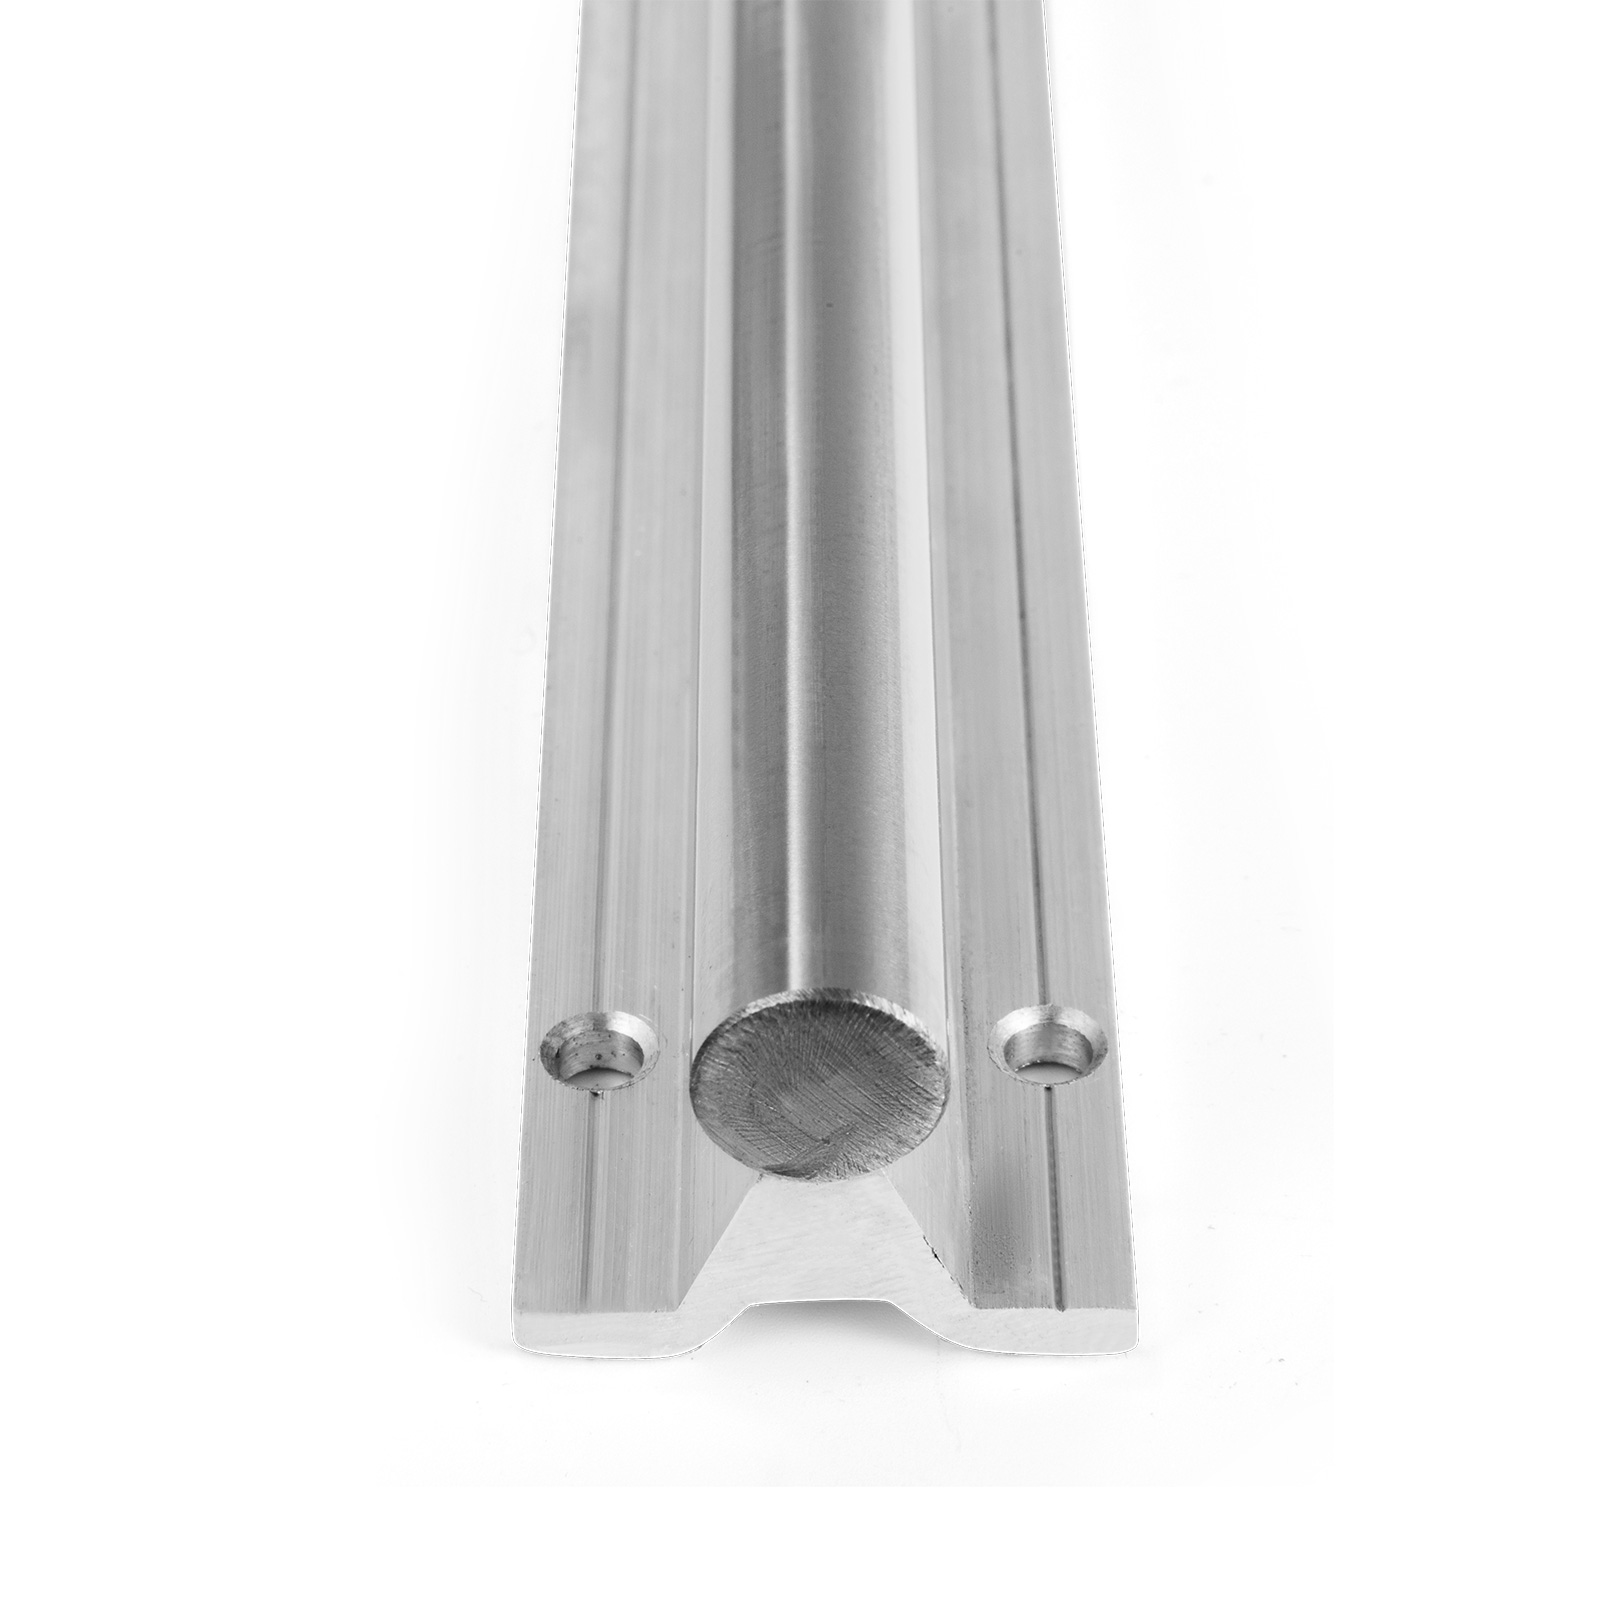 2X SBR16 650mm  bracket Linear RAIL aluminum cylinder support 4pc SBR16 BLOCK